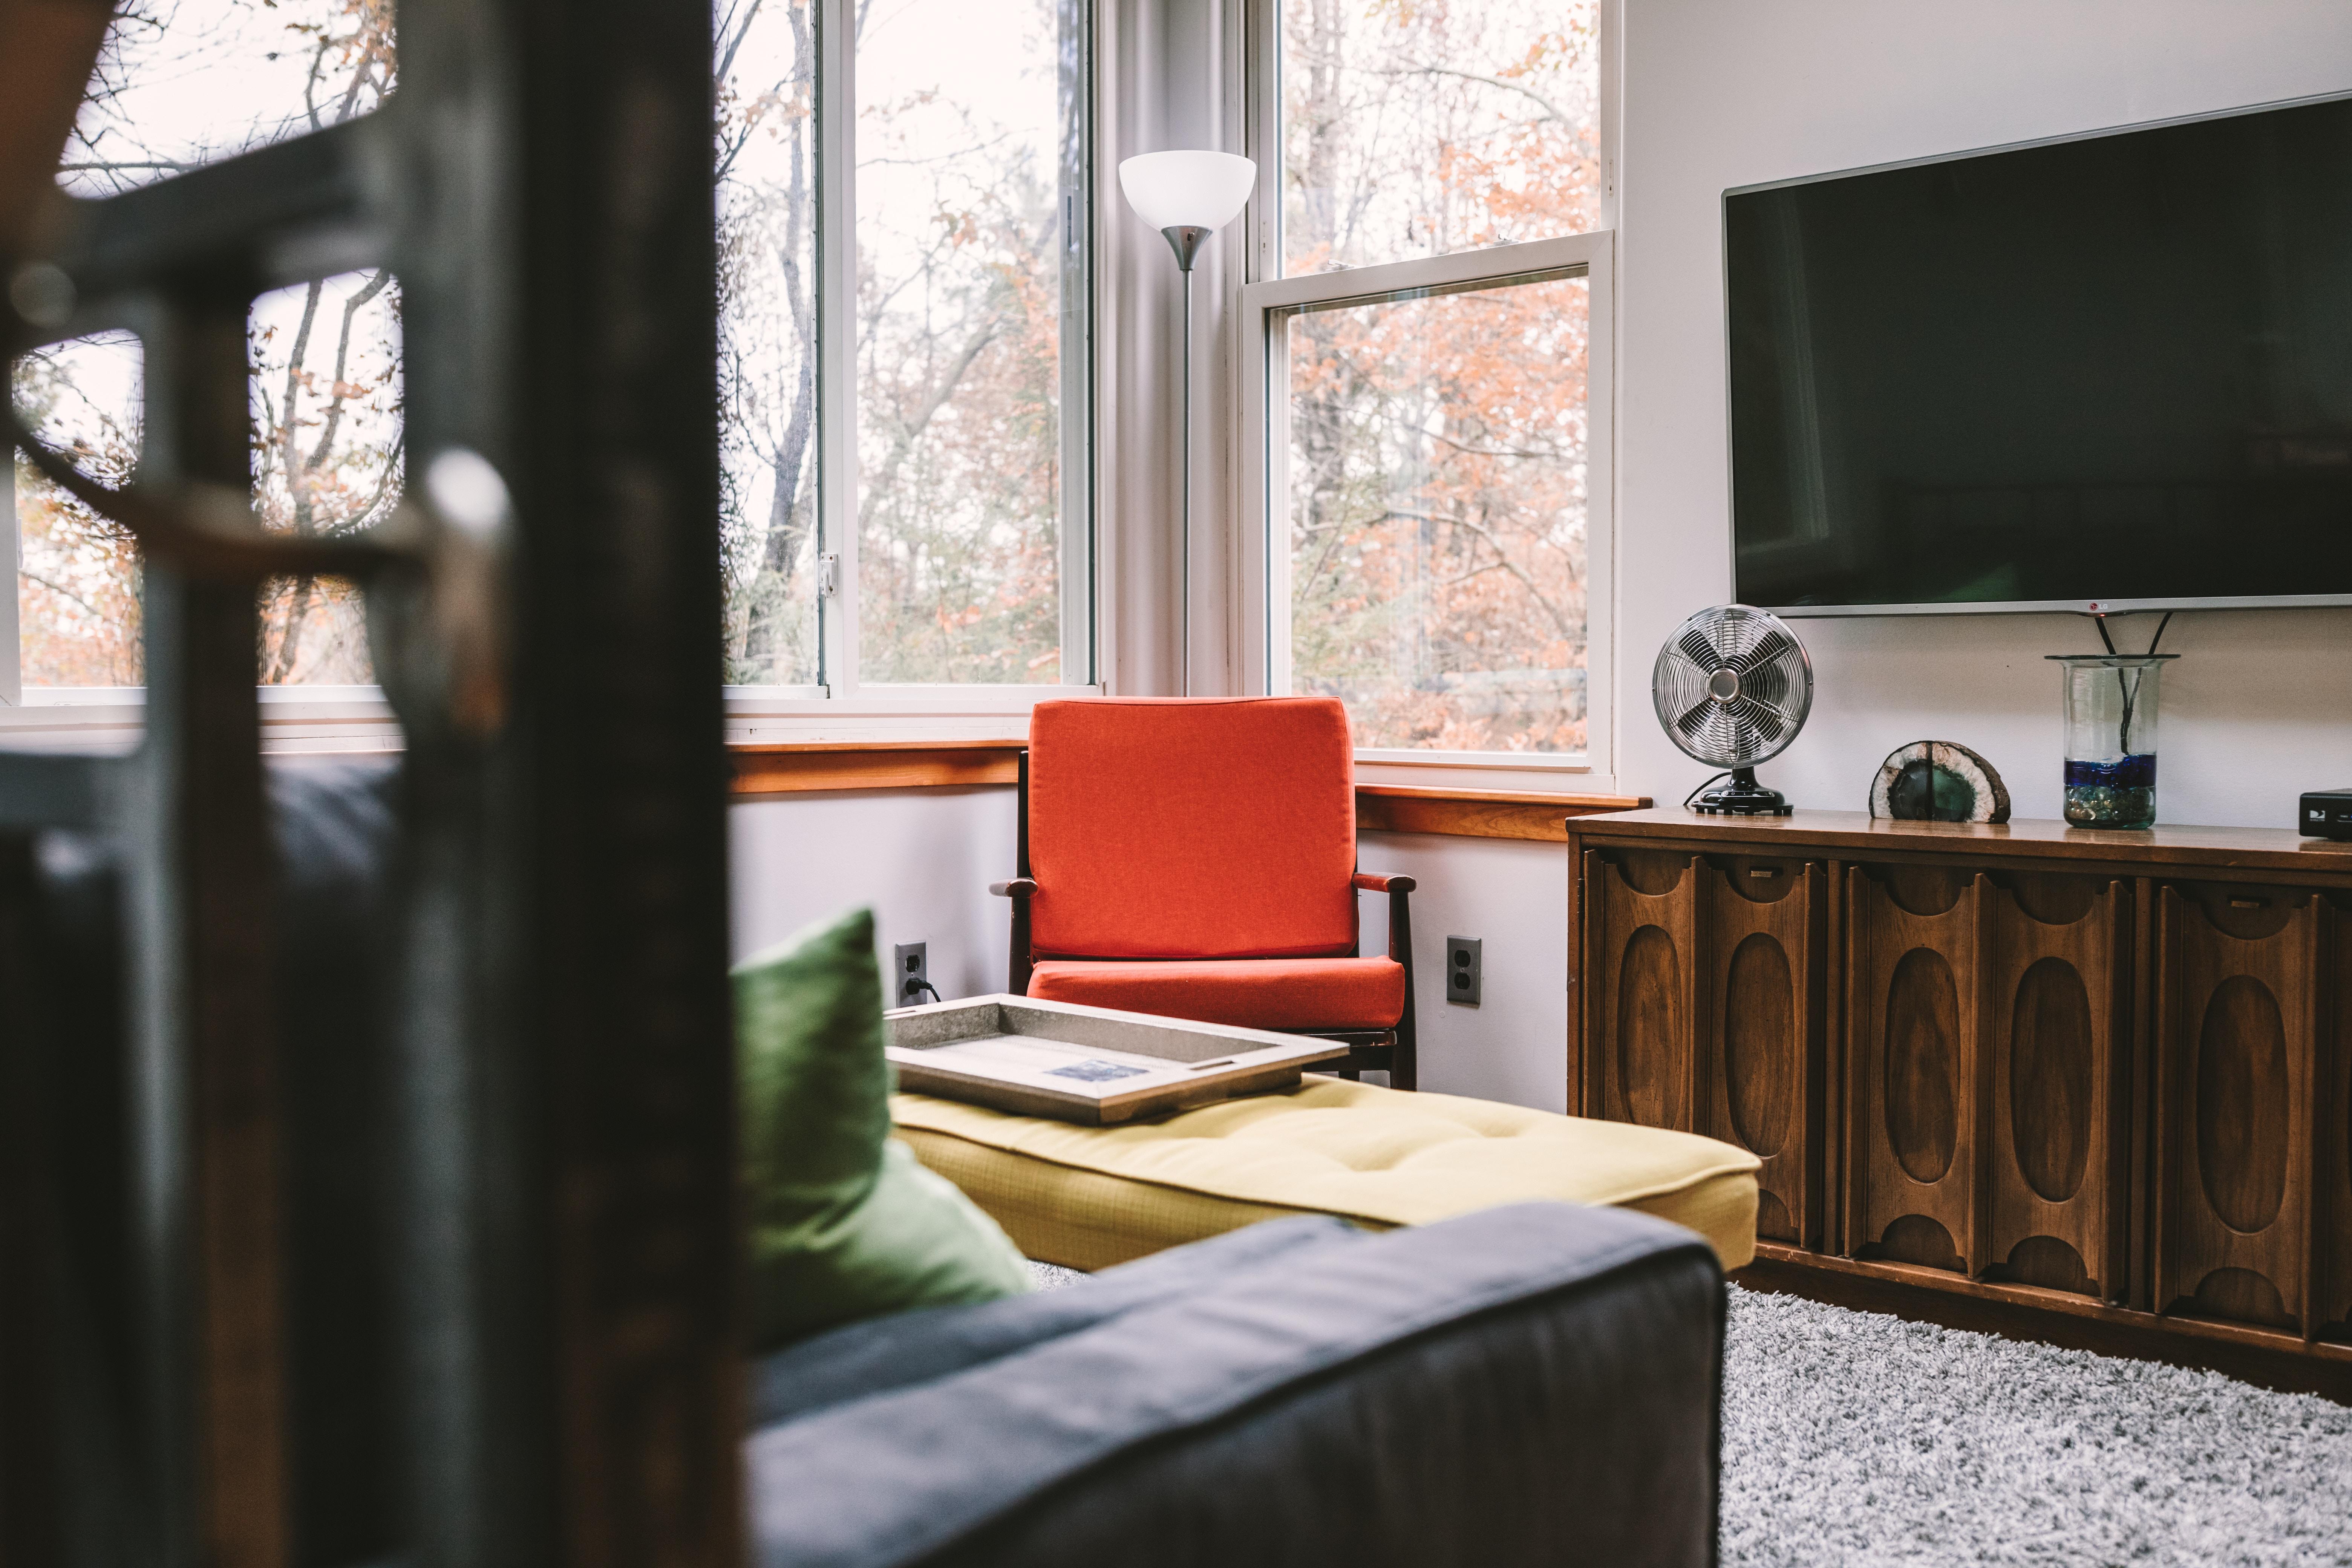 flat screen TV on white wall inside room